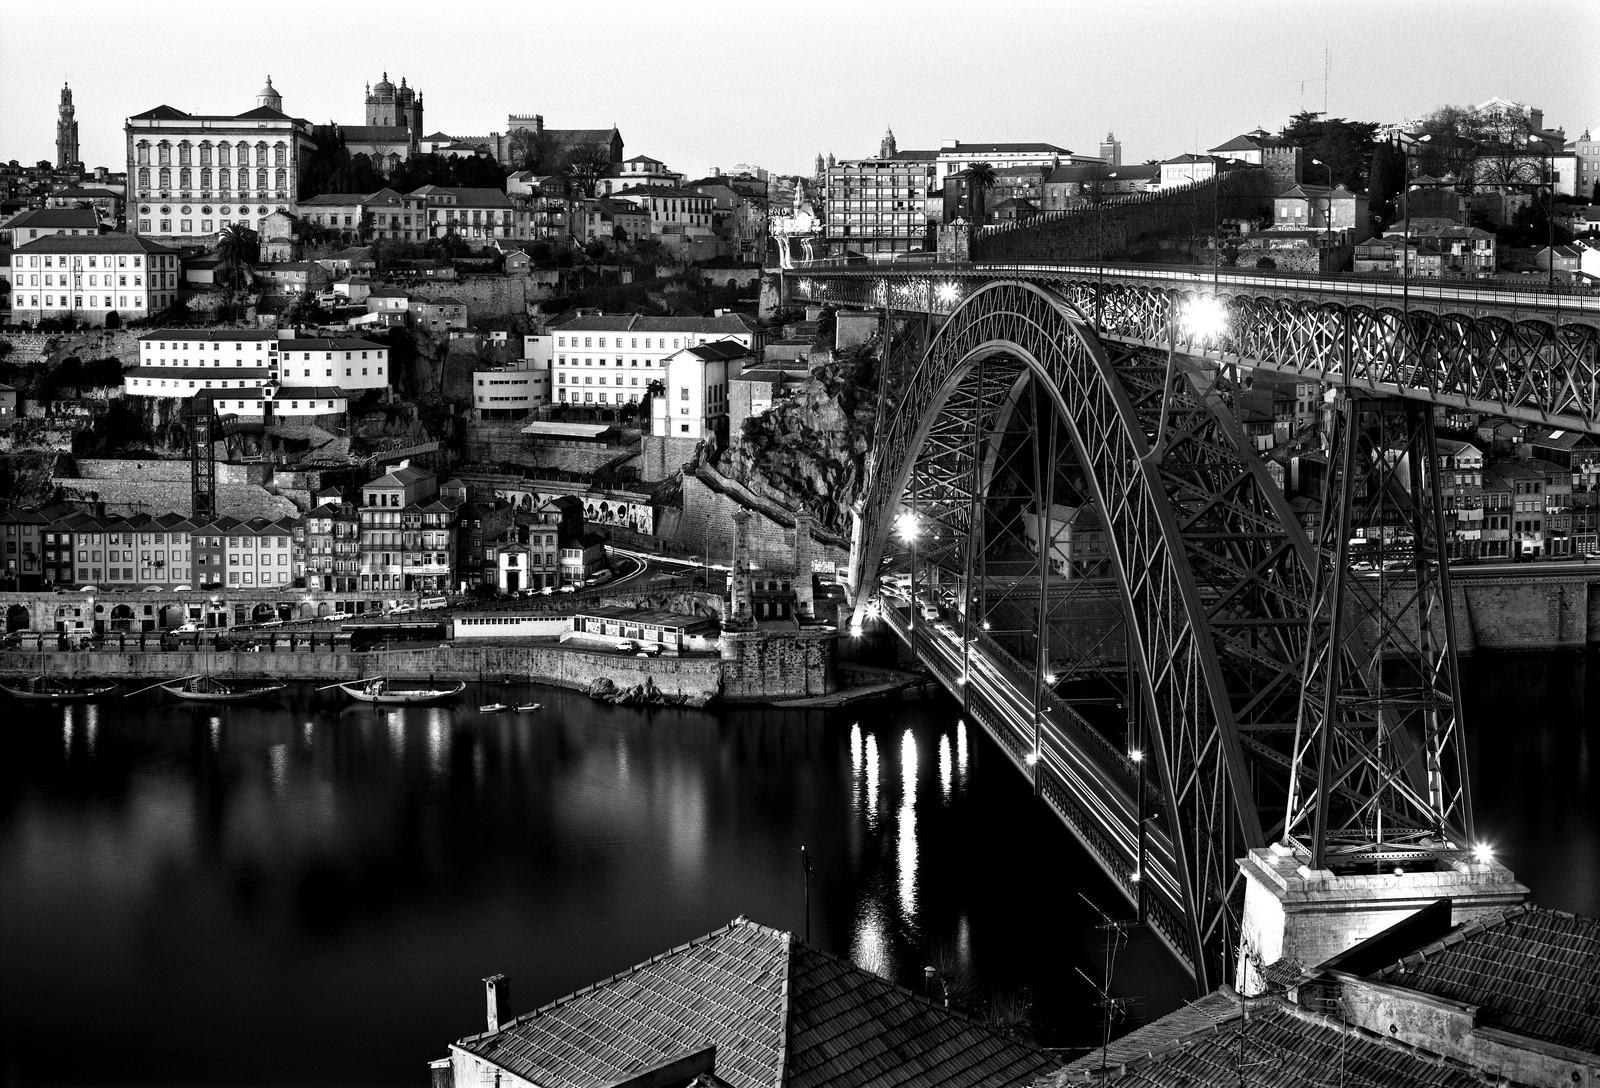 Gabriele Basilico, Porto 1995